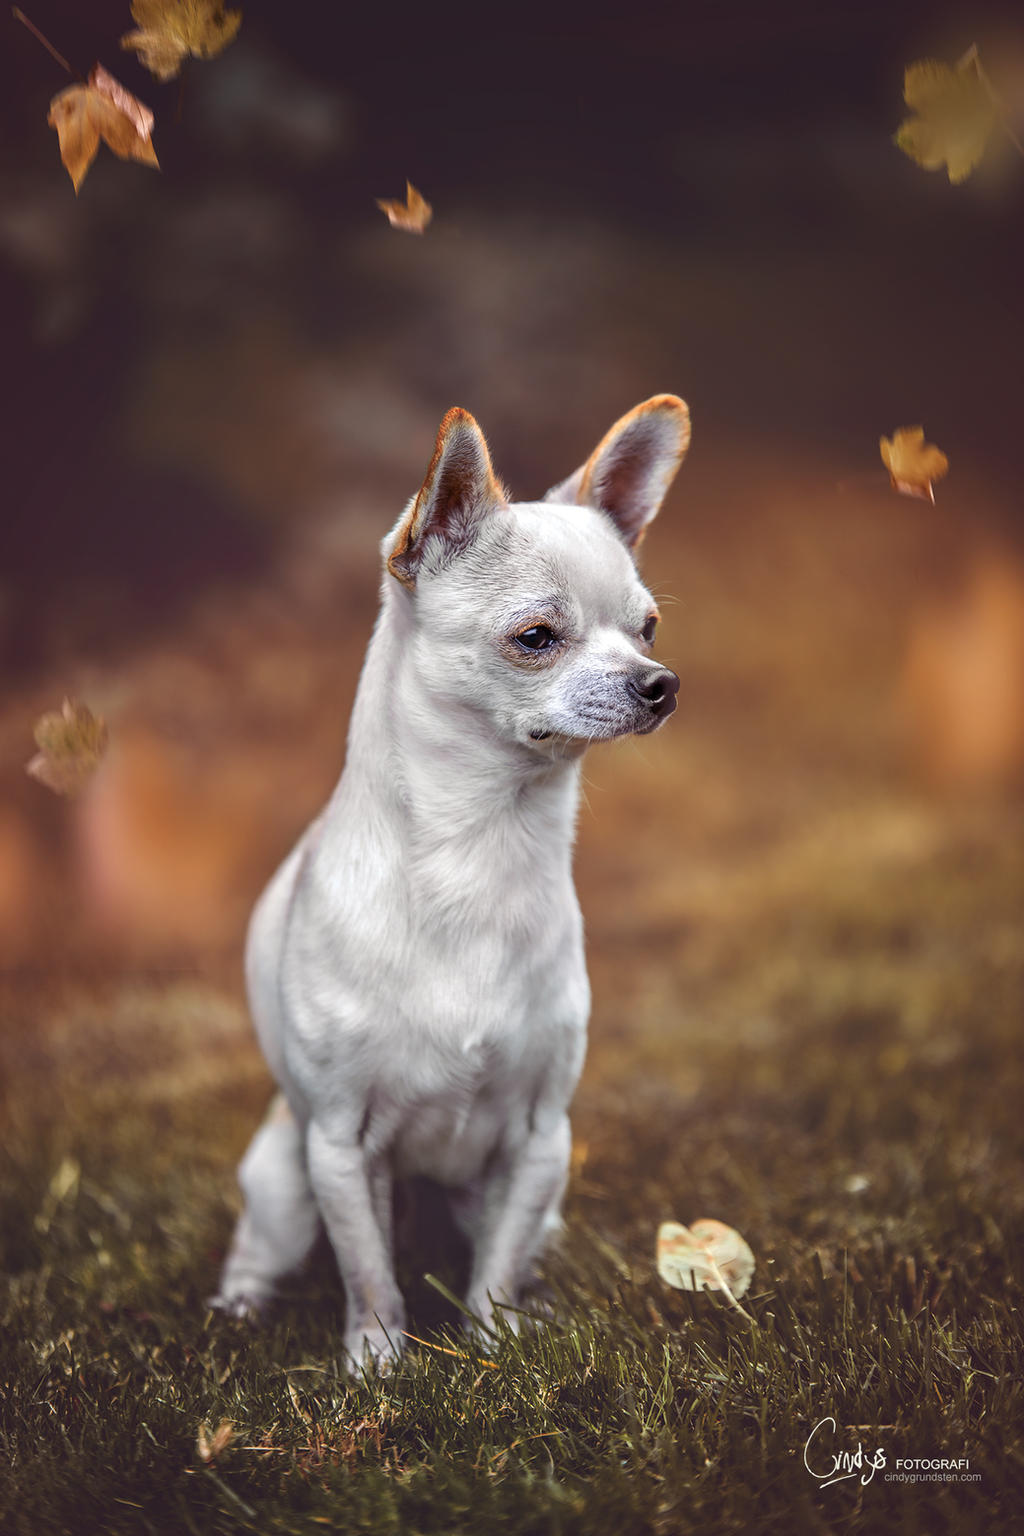 My little guy by CindysArt